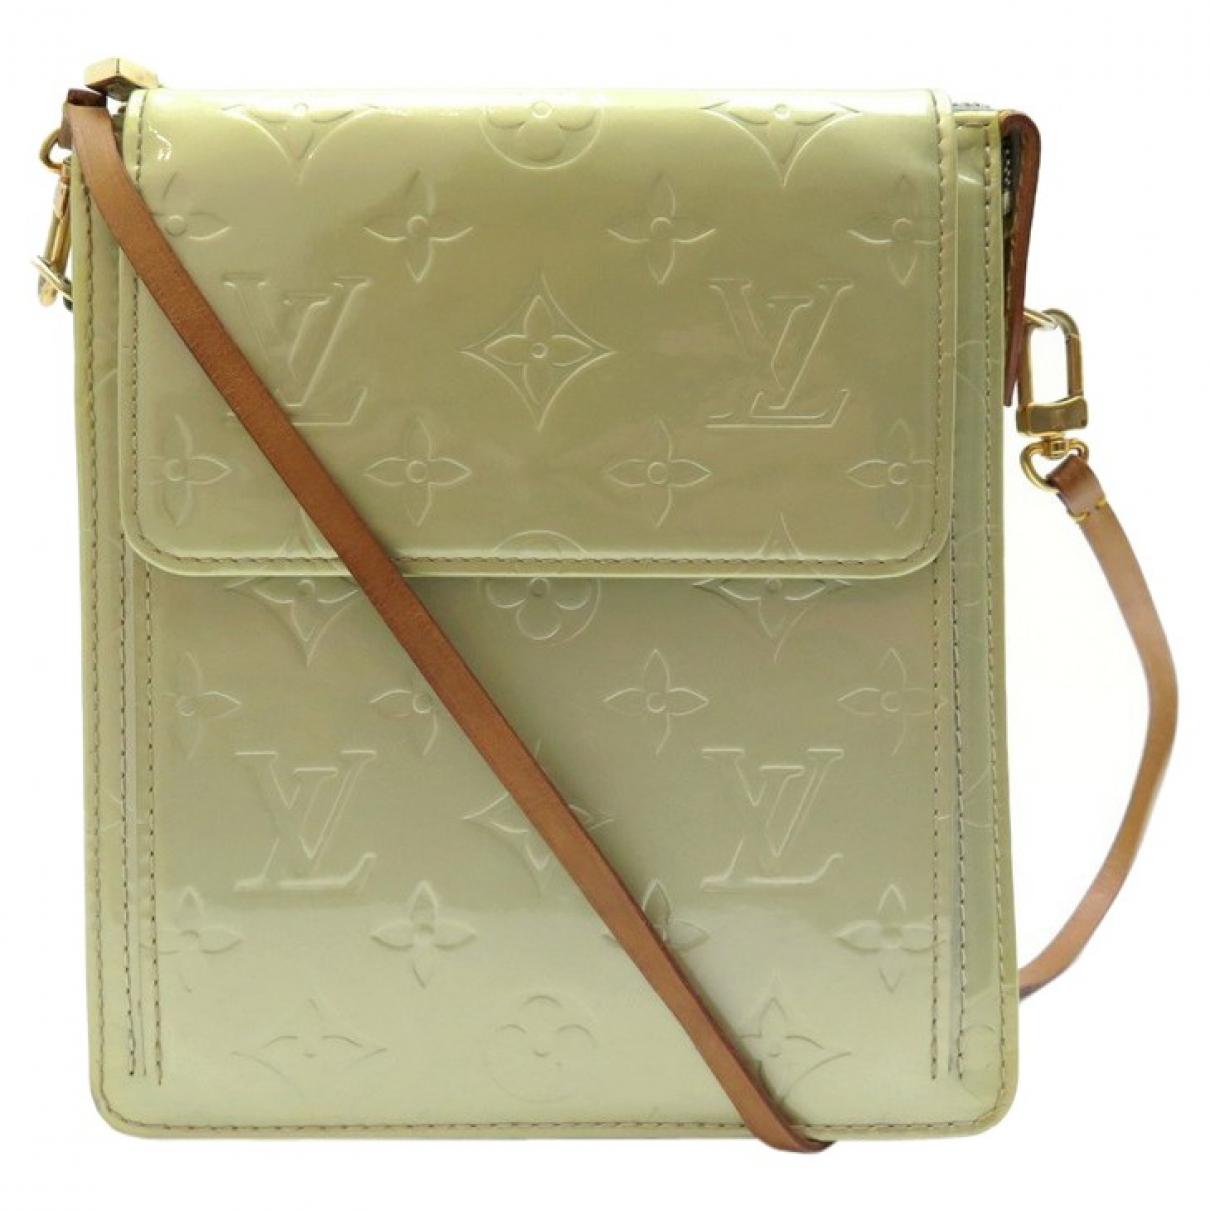 Louis Vuitton - Sac a main Mott  pour femme en cuir verni - vert